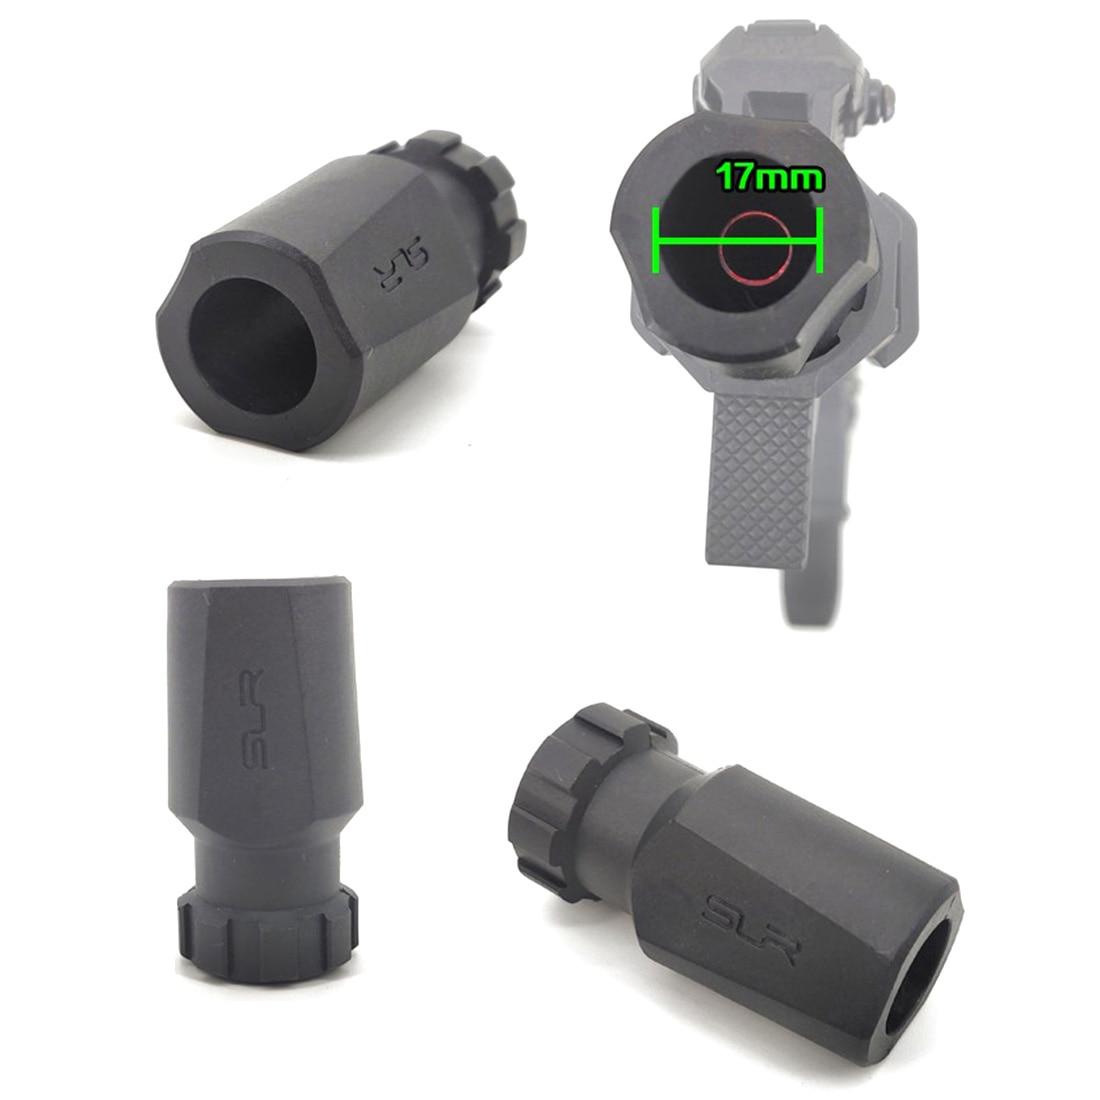 MODIKER Jingji 14mm SLR Nylon expansión agujero de rosca inversa barril tapa decorativa para JM 10/14mm CCW agua Gel Beads Blaster